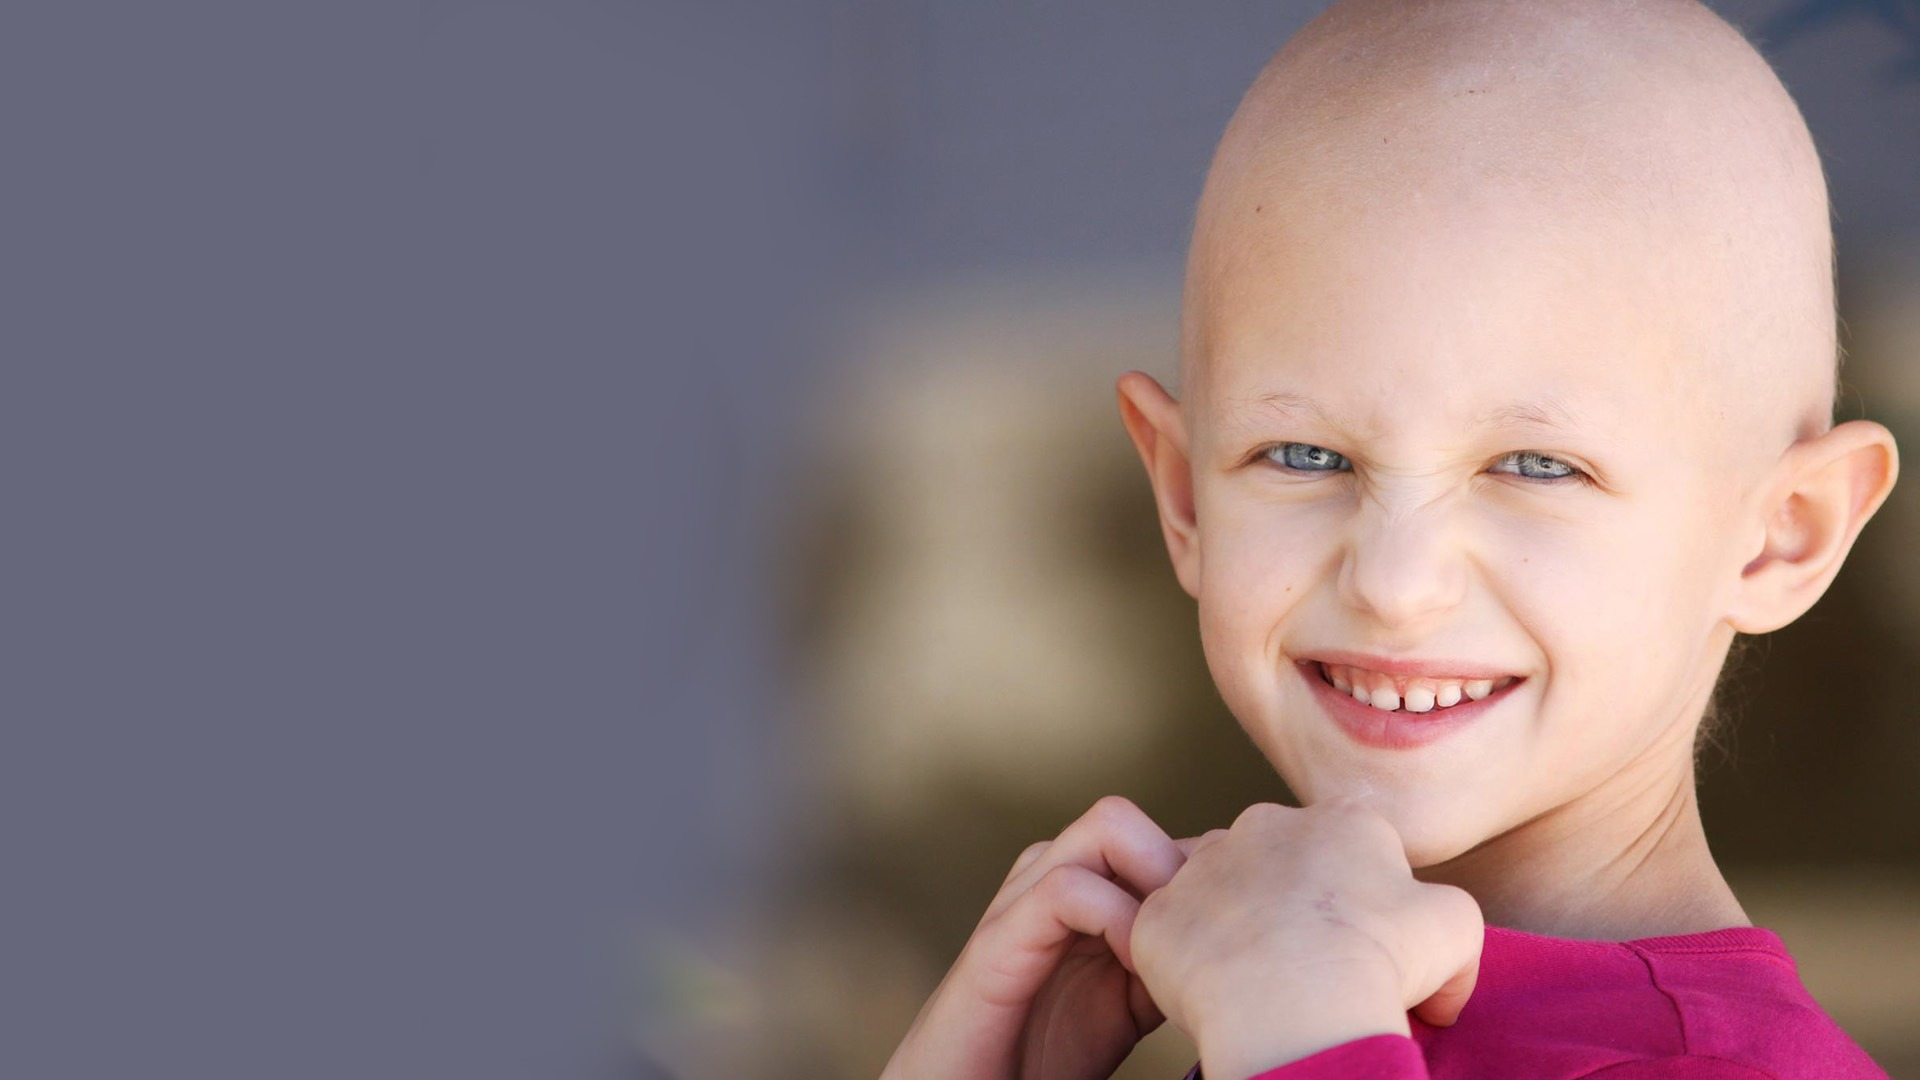 child with pediatric brain cancer